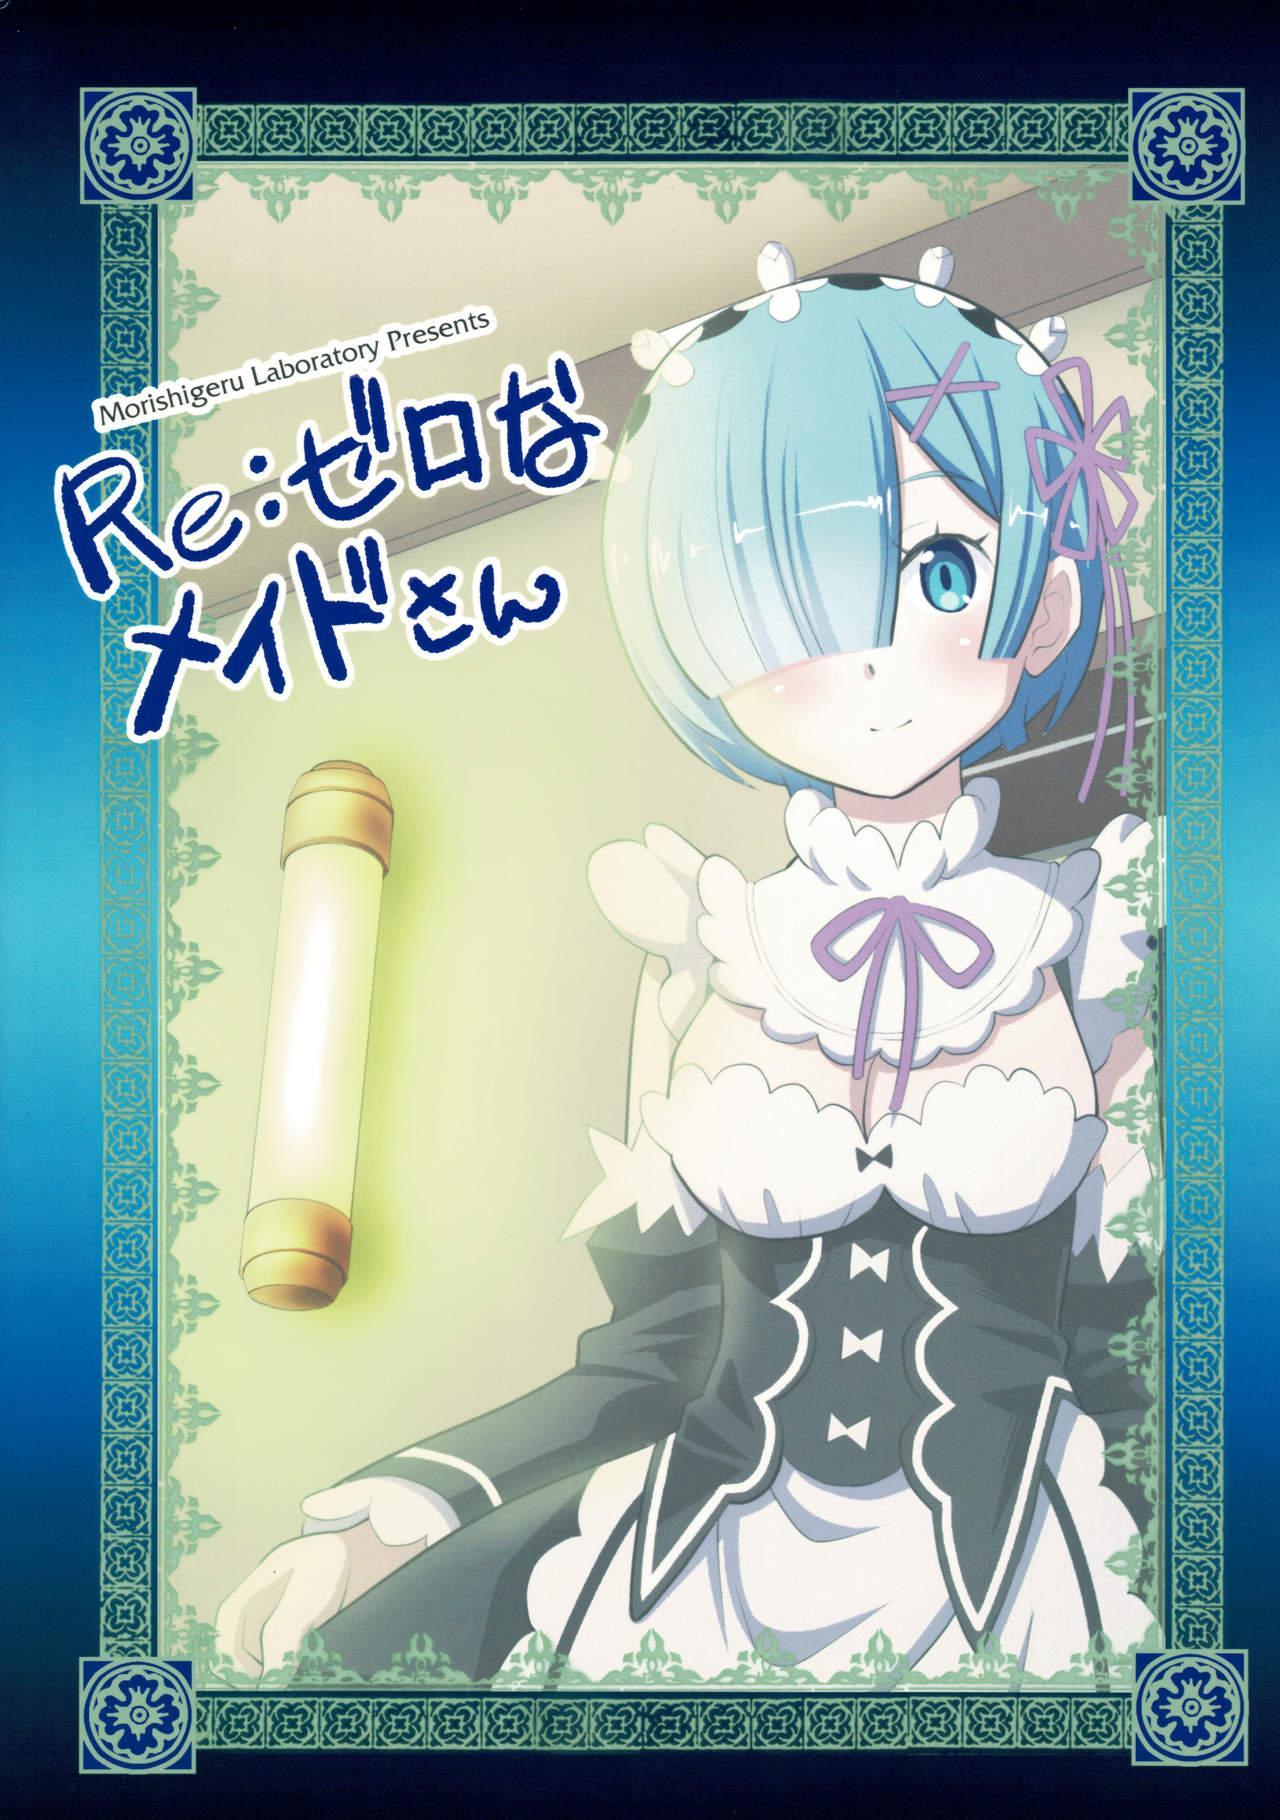 Re:Zero na Maid-san   The Maids of Re:Zero 13